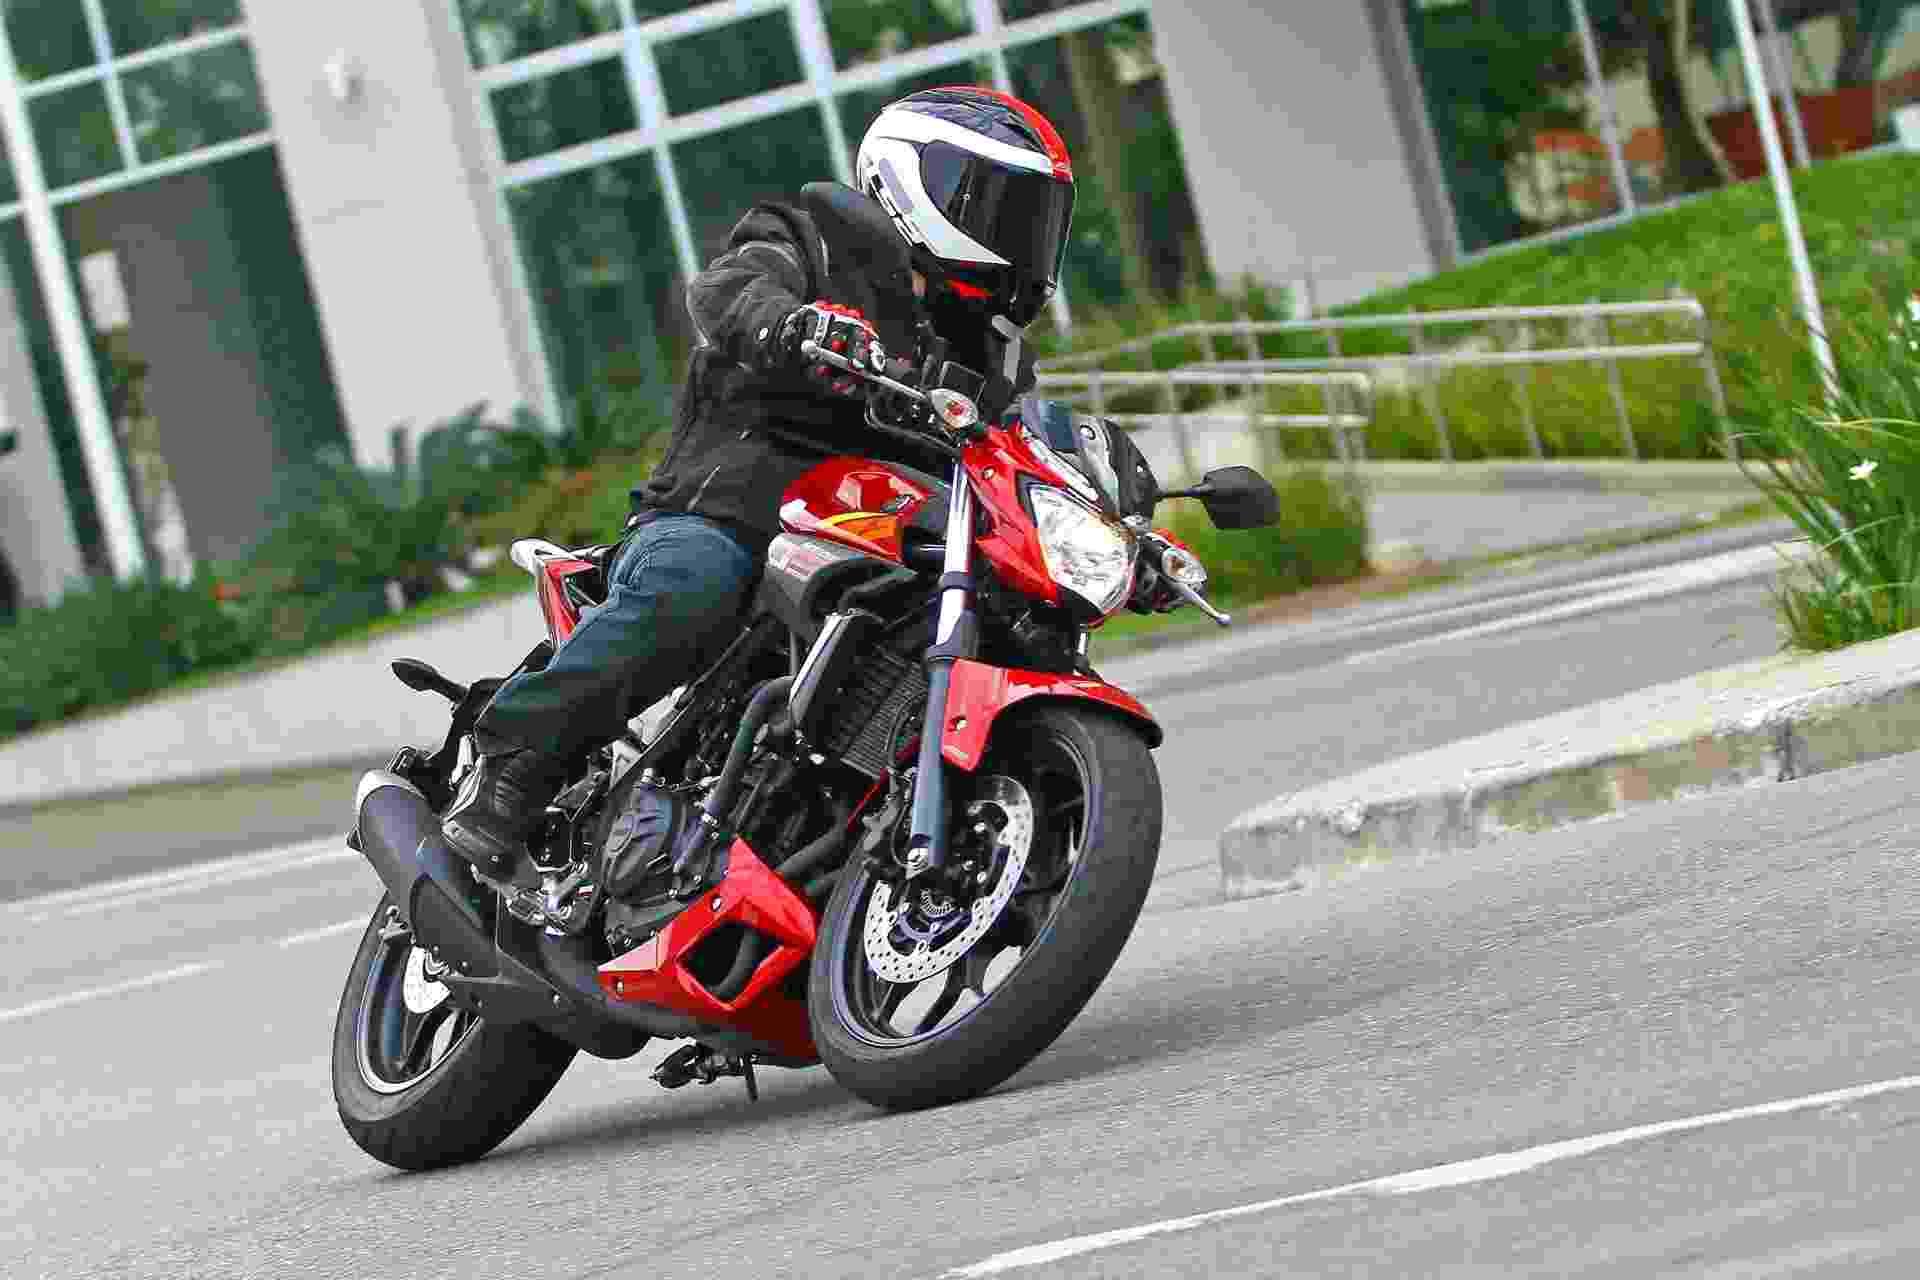 Yamaha MT-03 - Mario Villaescusa/Infomoto